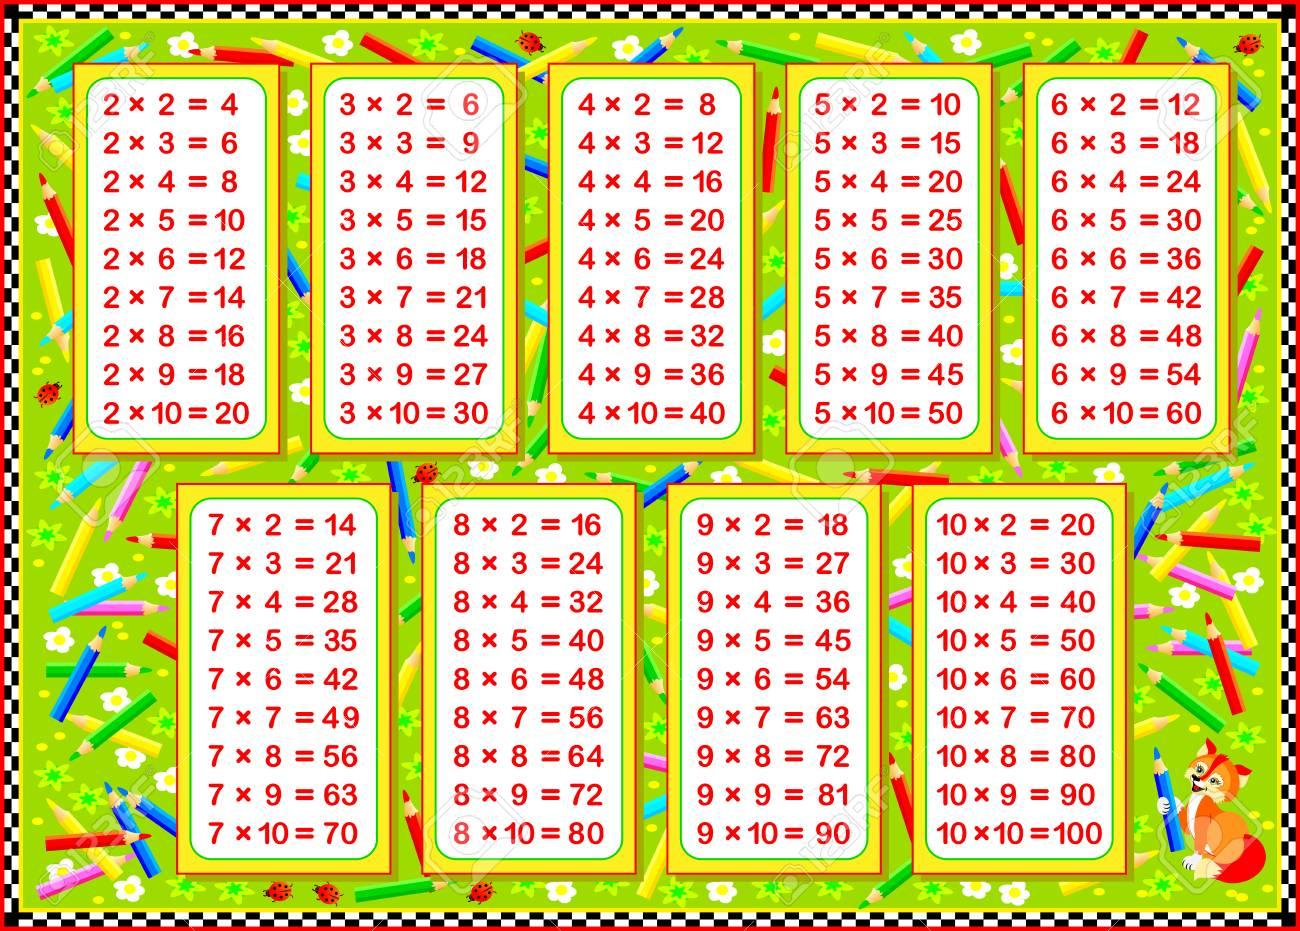 Multiplication Table For Children On Green Background Vector